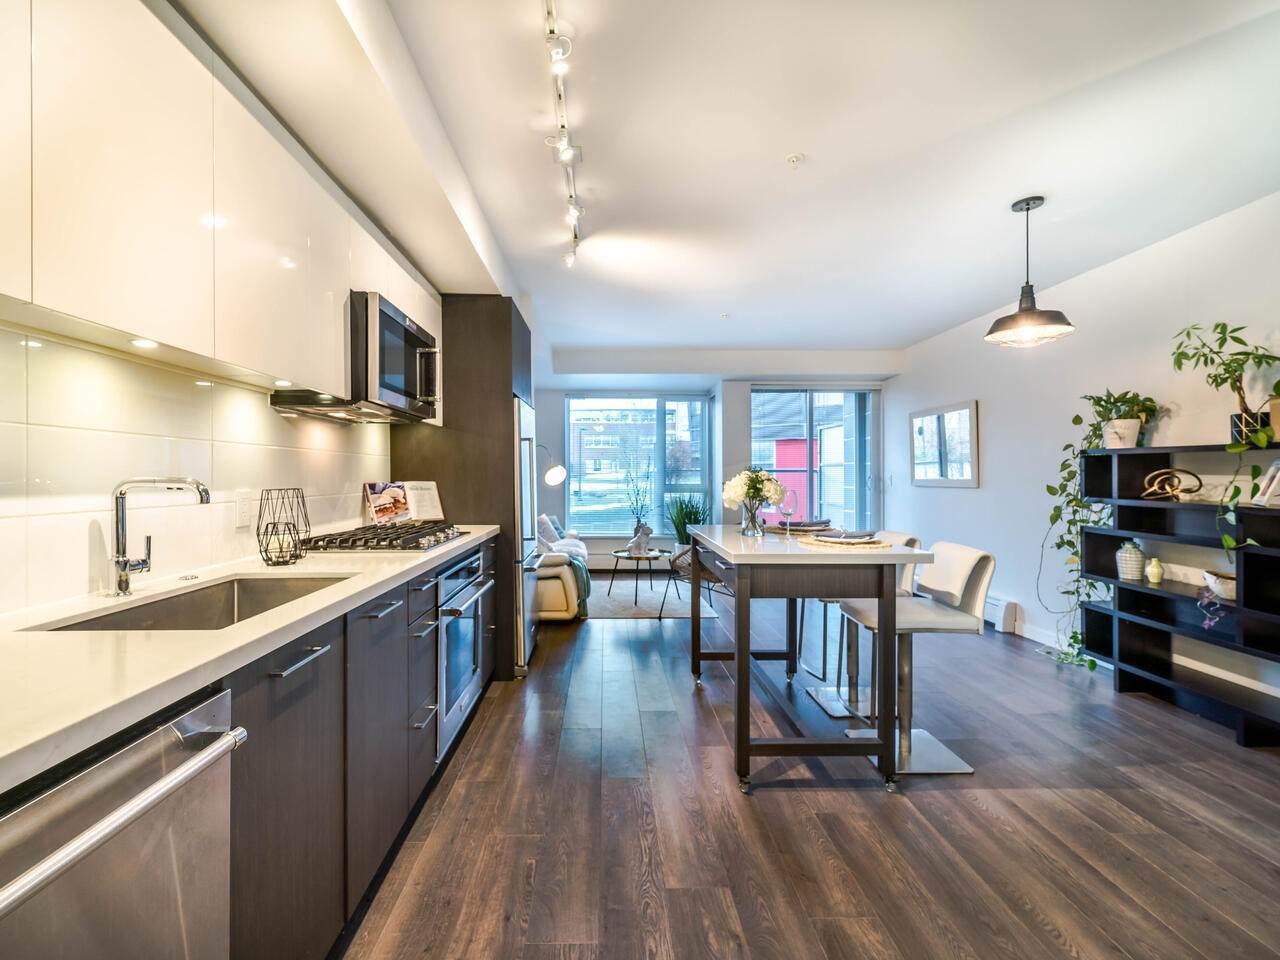 384-e-1st-avenue-strathcona-vancouver-east-11 at 318 - 384 E 1st Avenue, Strathcona, Vancouver East